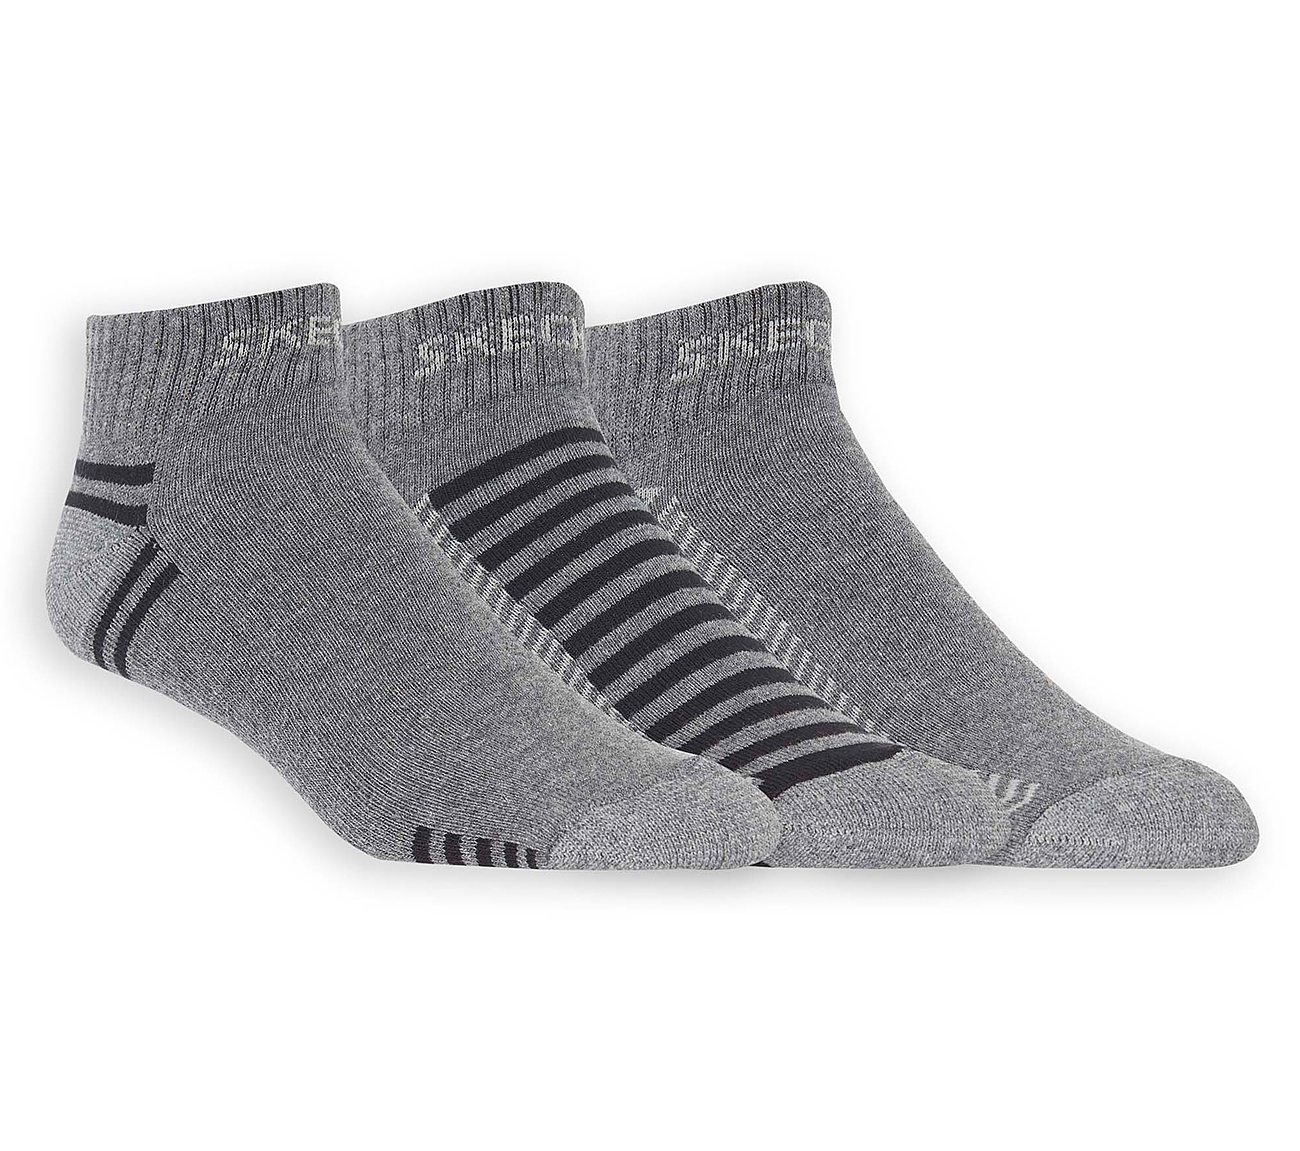 3 Pack Low Cut Terry Trainer Work Socks